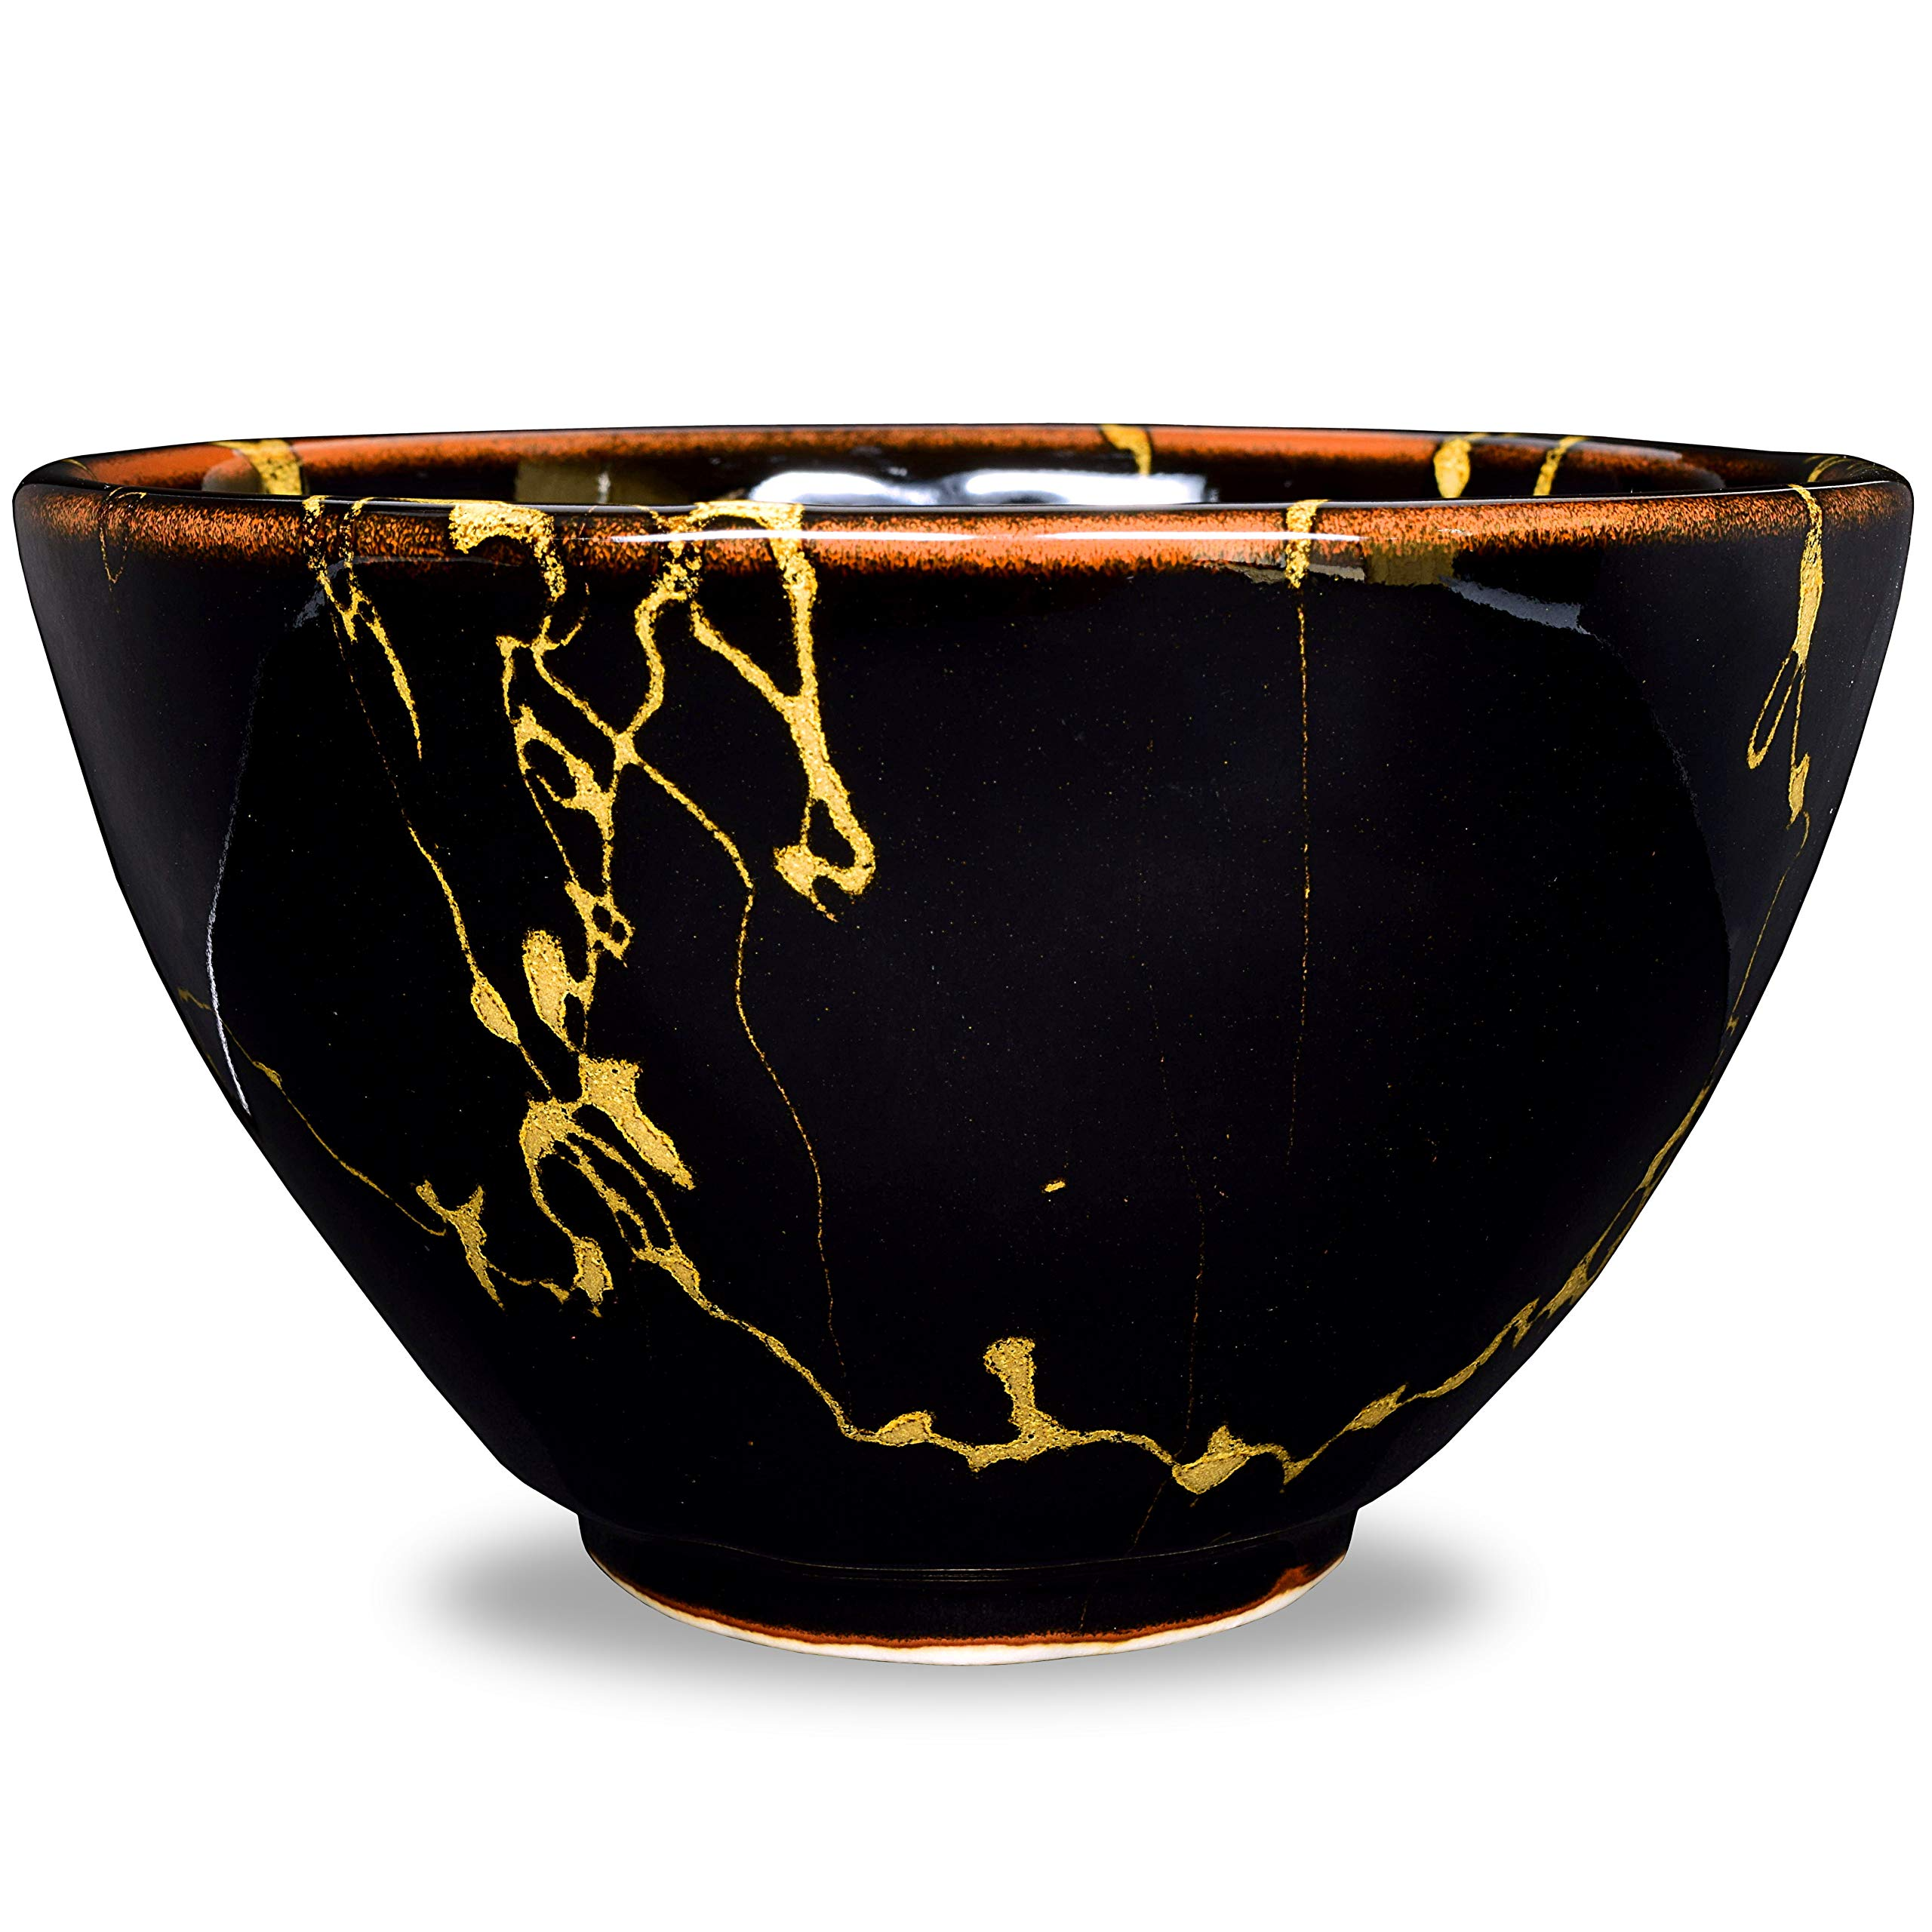 Japanese Handcrafted Matcha Bowl Black, Multi Purpose Bowl, Authentic Mino Ware Pottery, Hotarubi Hime Chawan by Mino Ware